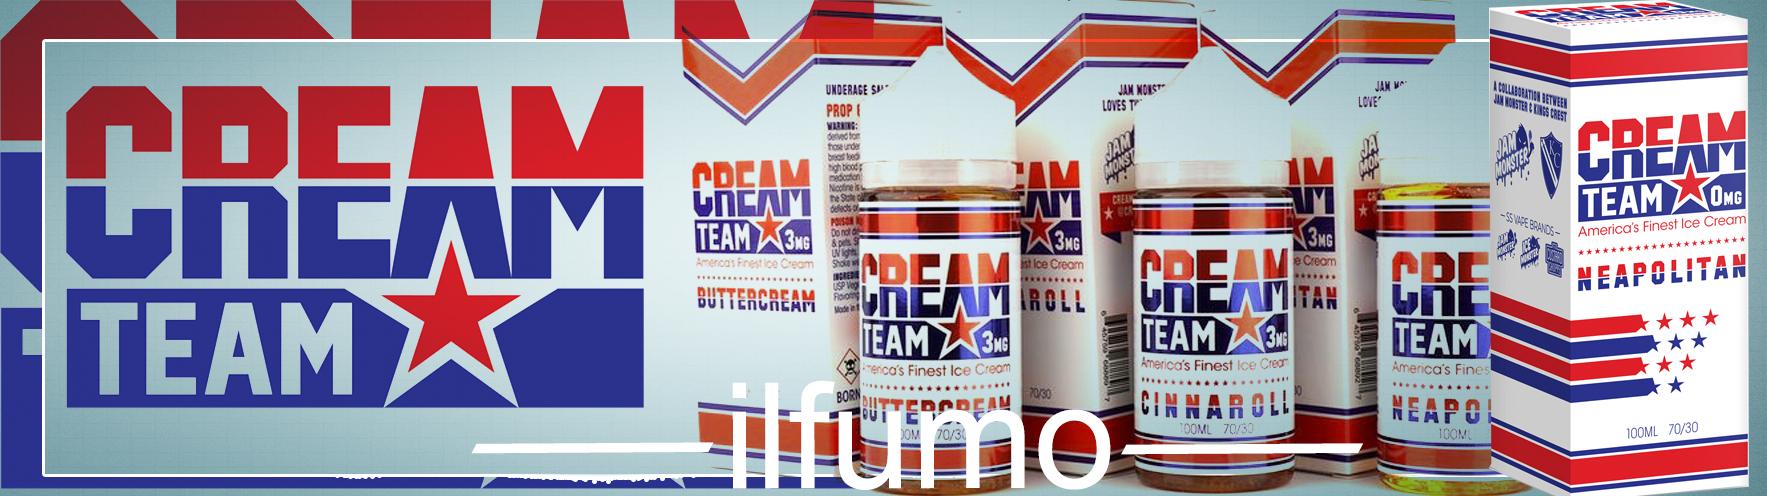 cream team vape optom ilfumo - Жидкость Cream Team